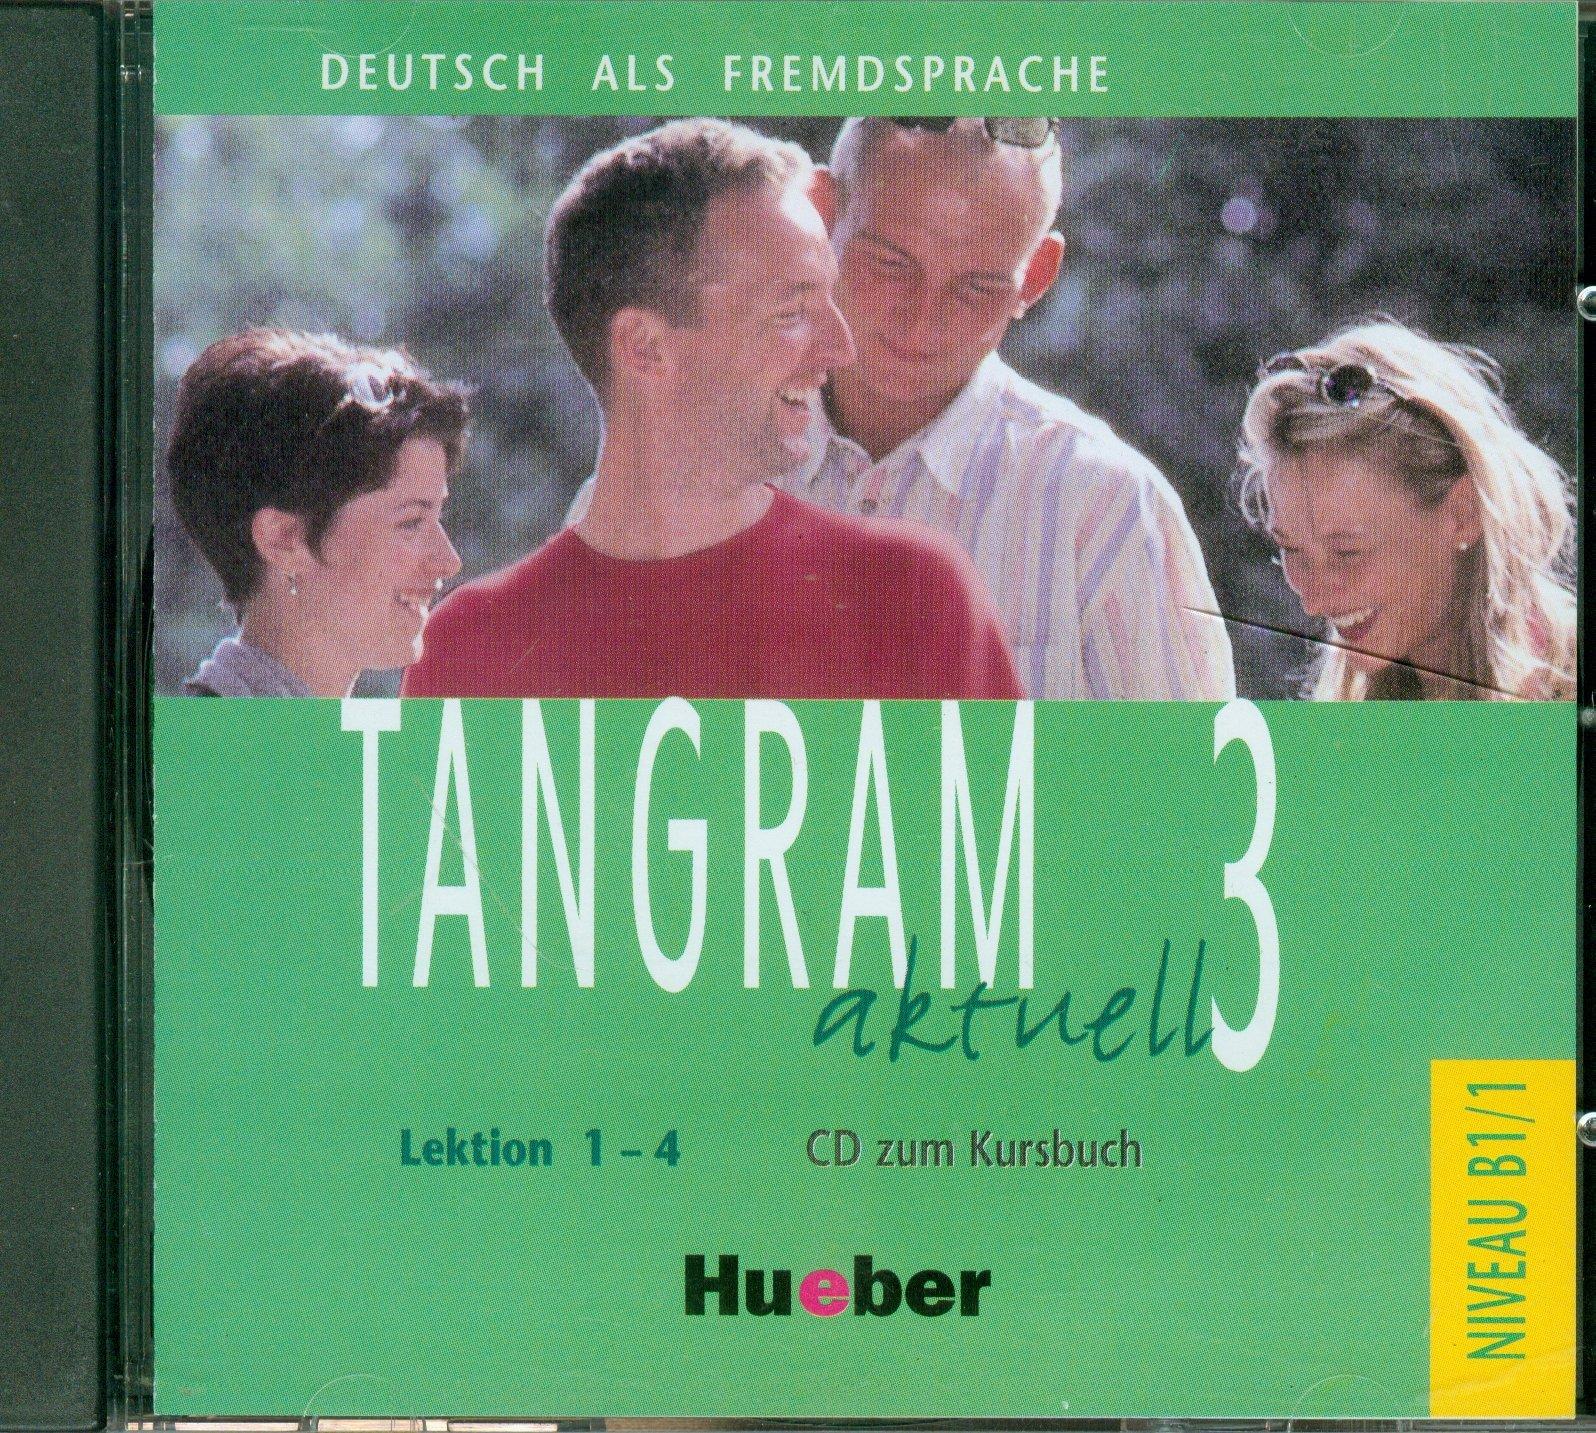 Tangram aktuell 3 CD Lektion 1 - 4 Tangram aktuell 3 CD Lektion 1 - 4